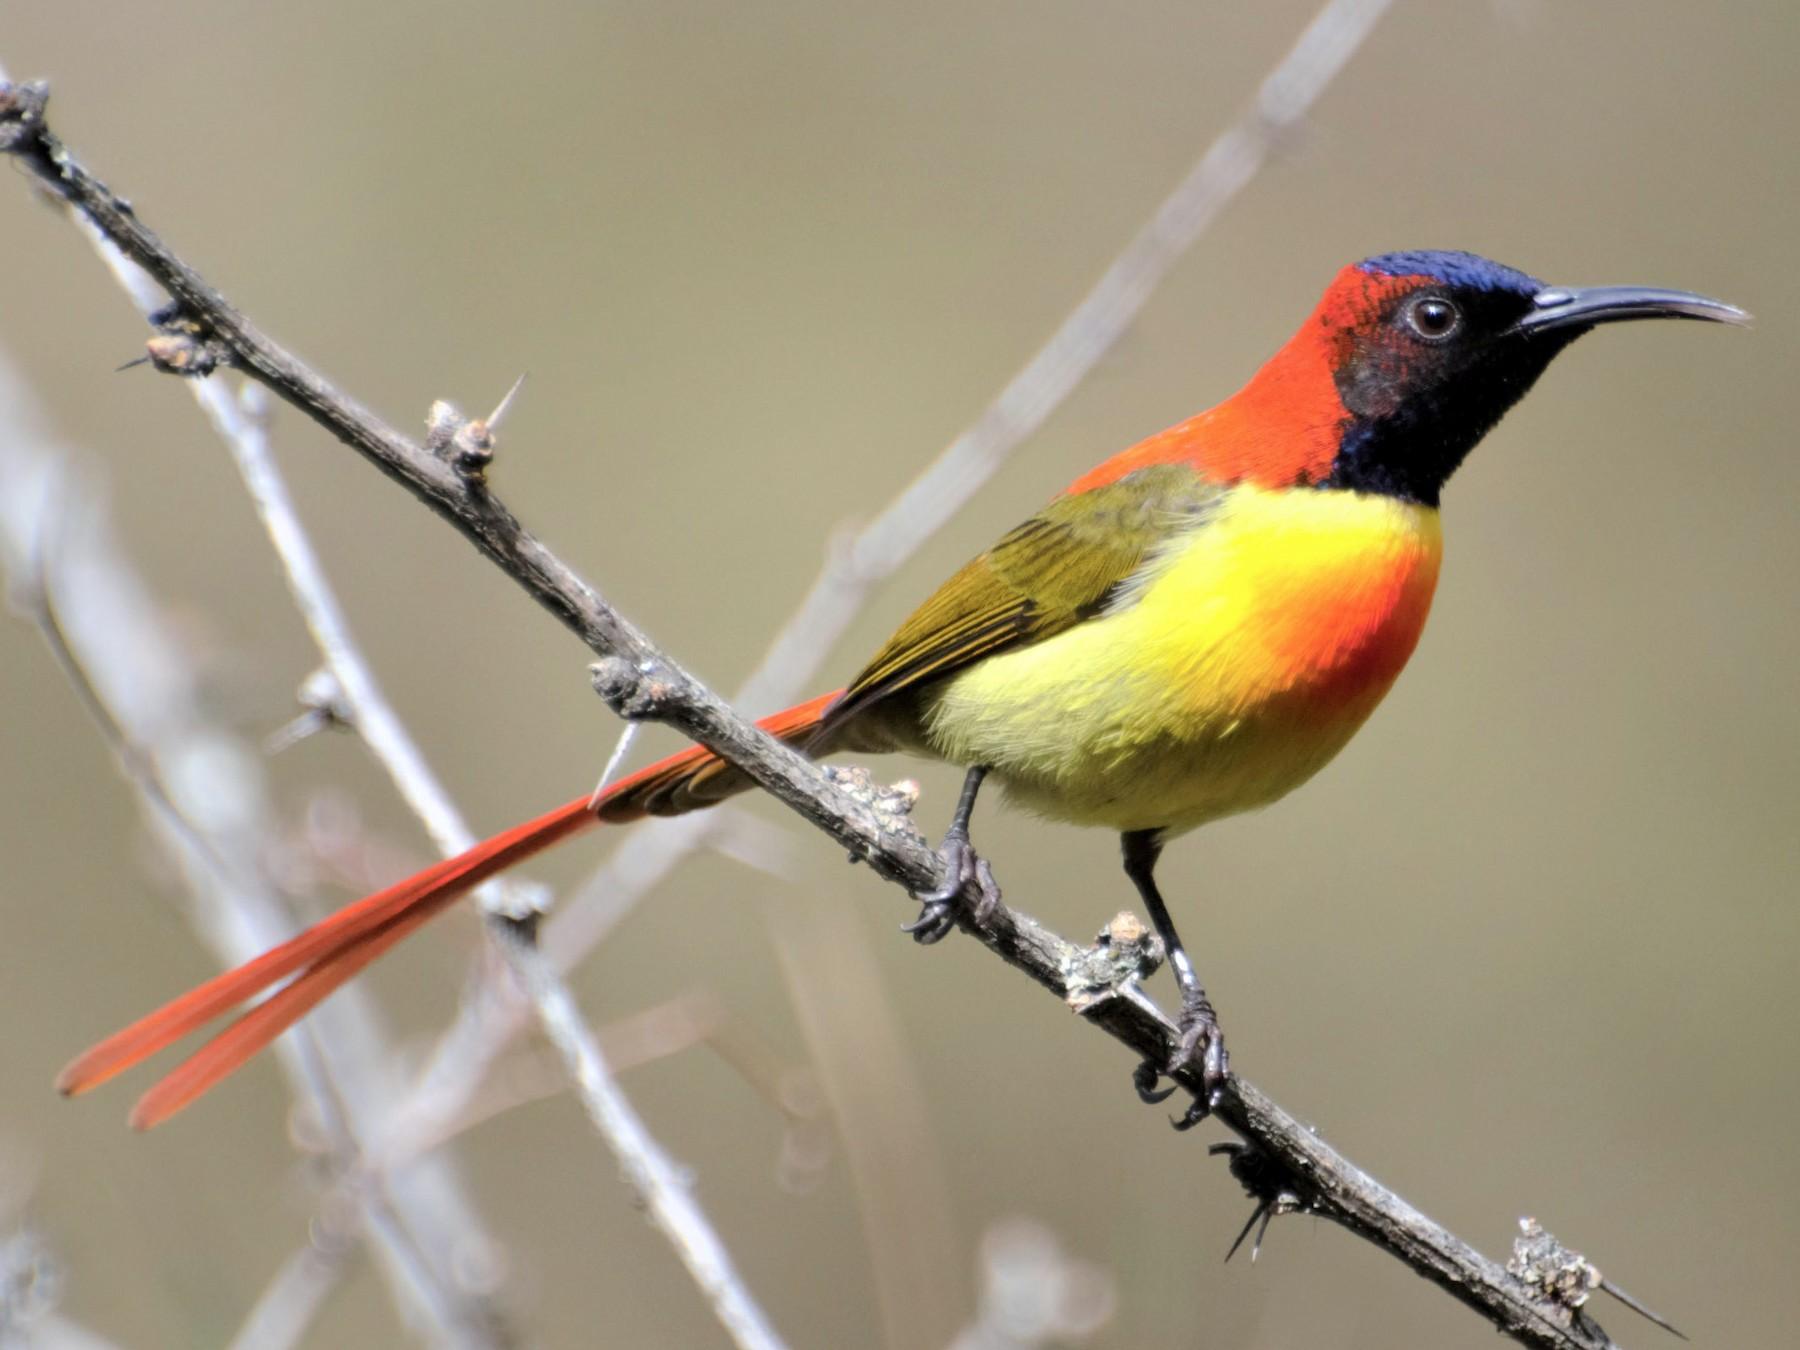 Fire-tailed Sunbird - Hathan Chaudhary